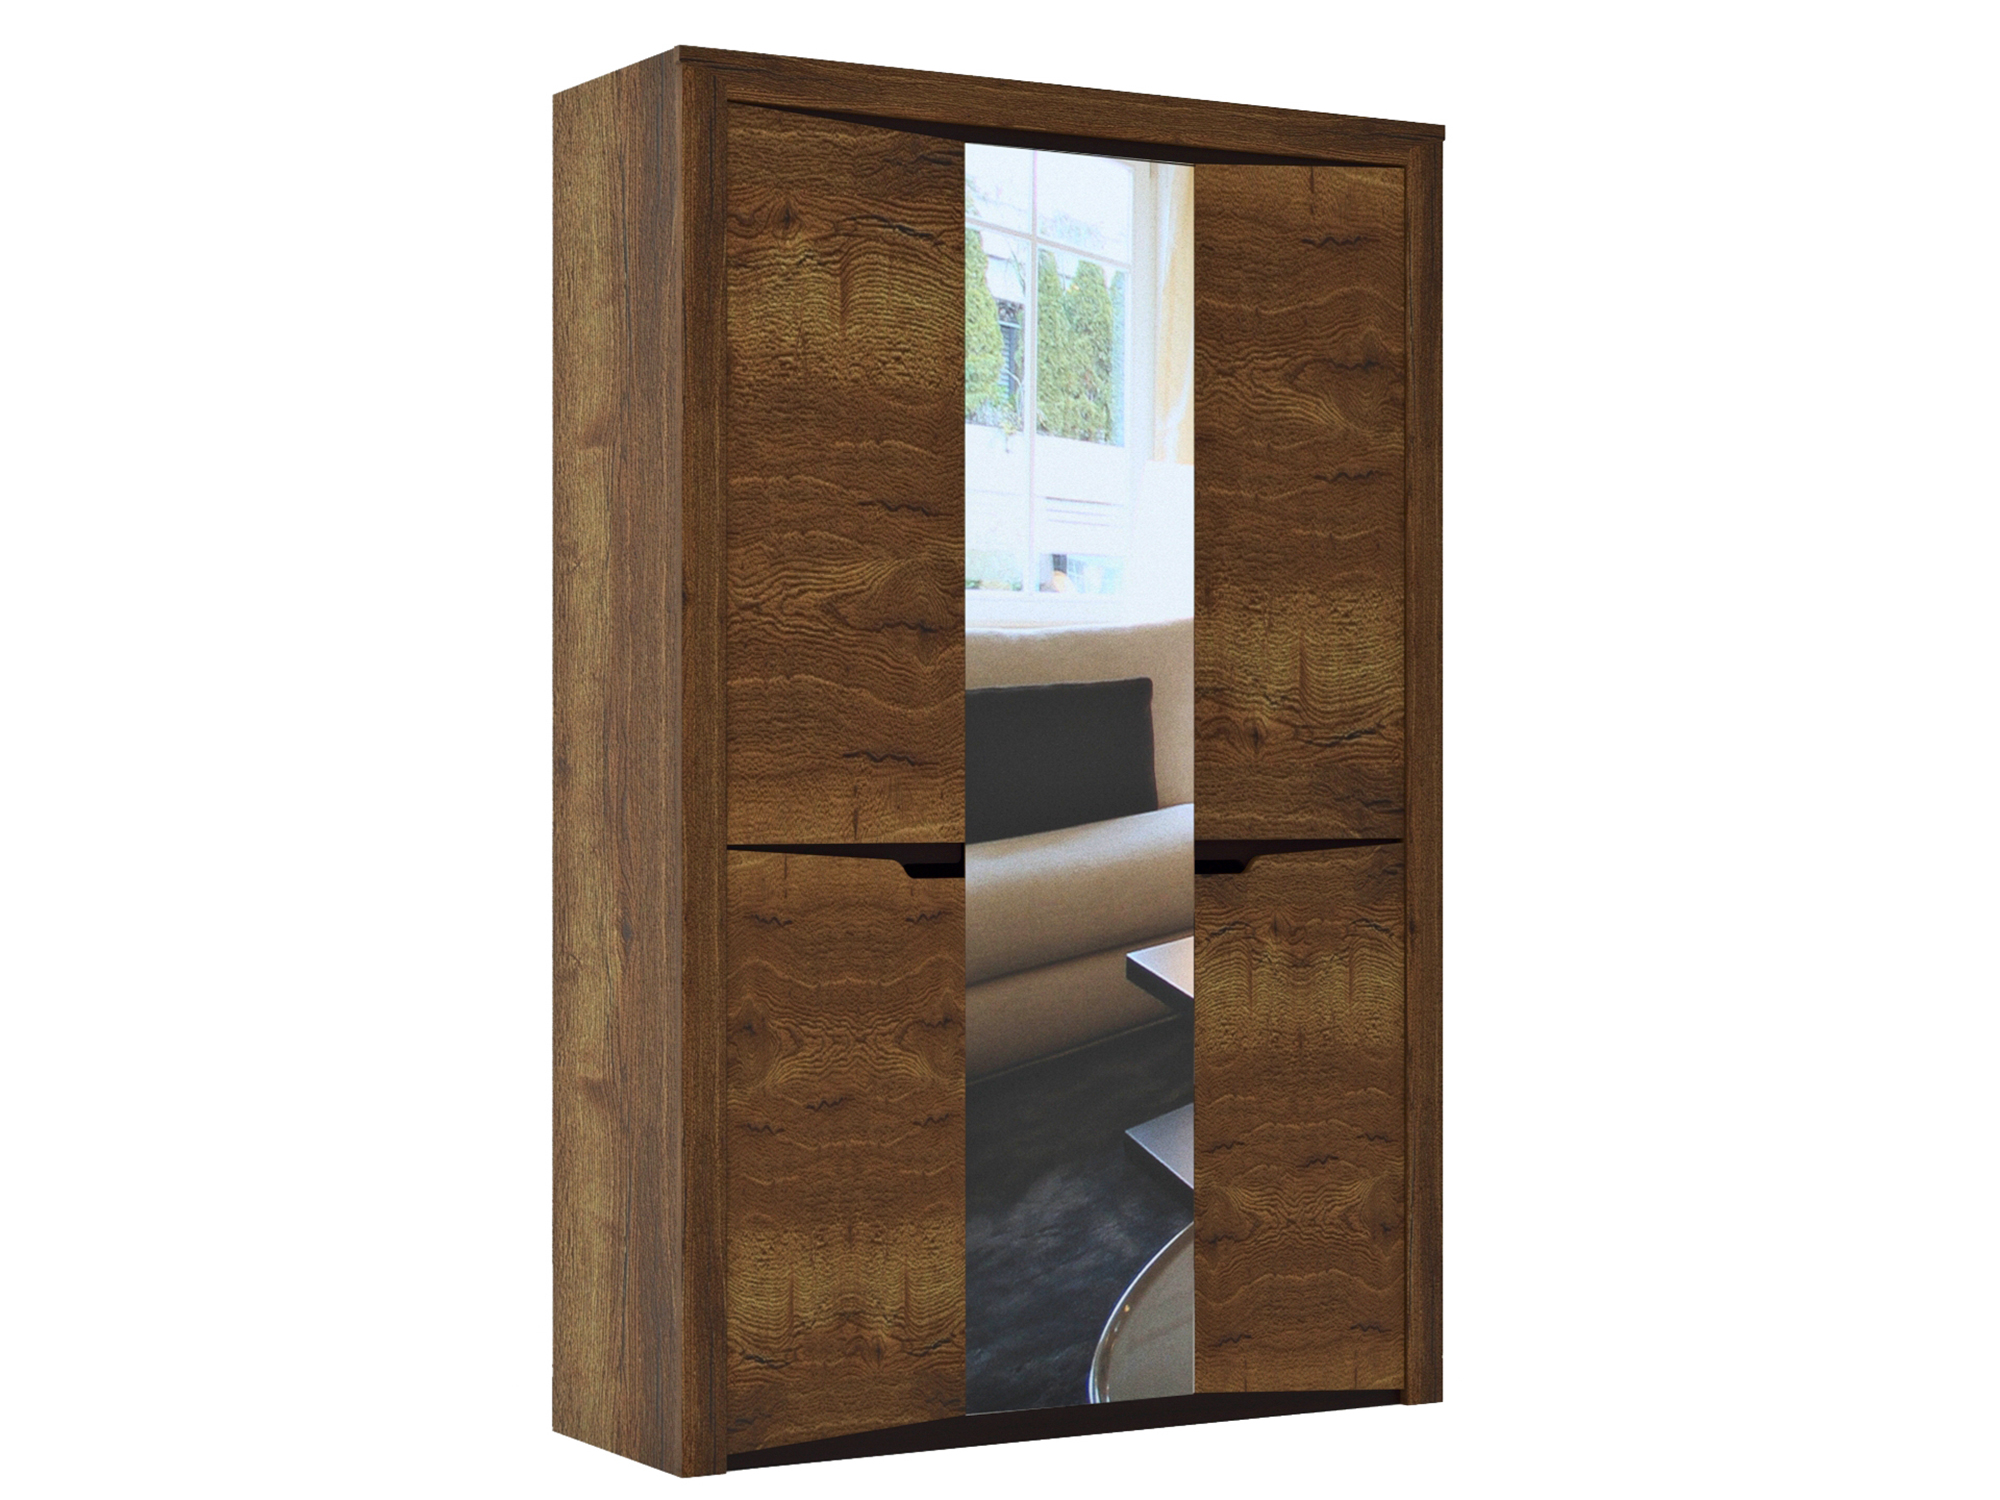 Шкаф 3-х дверный Гарда Дуб галифакс табак, Коричневый, Коричневый